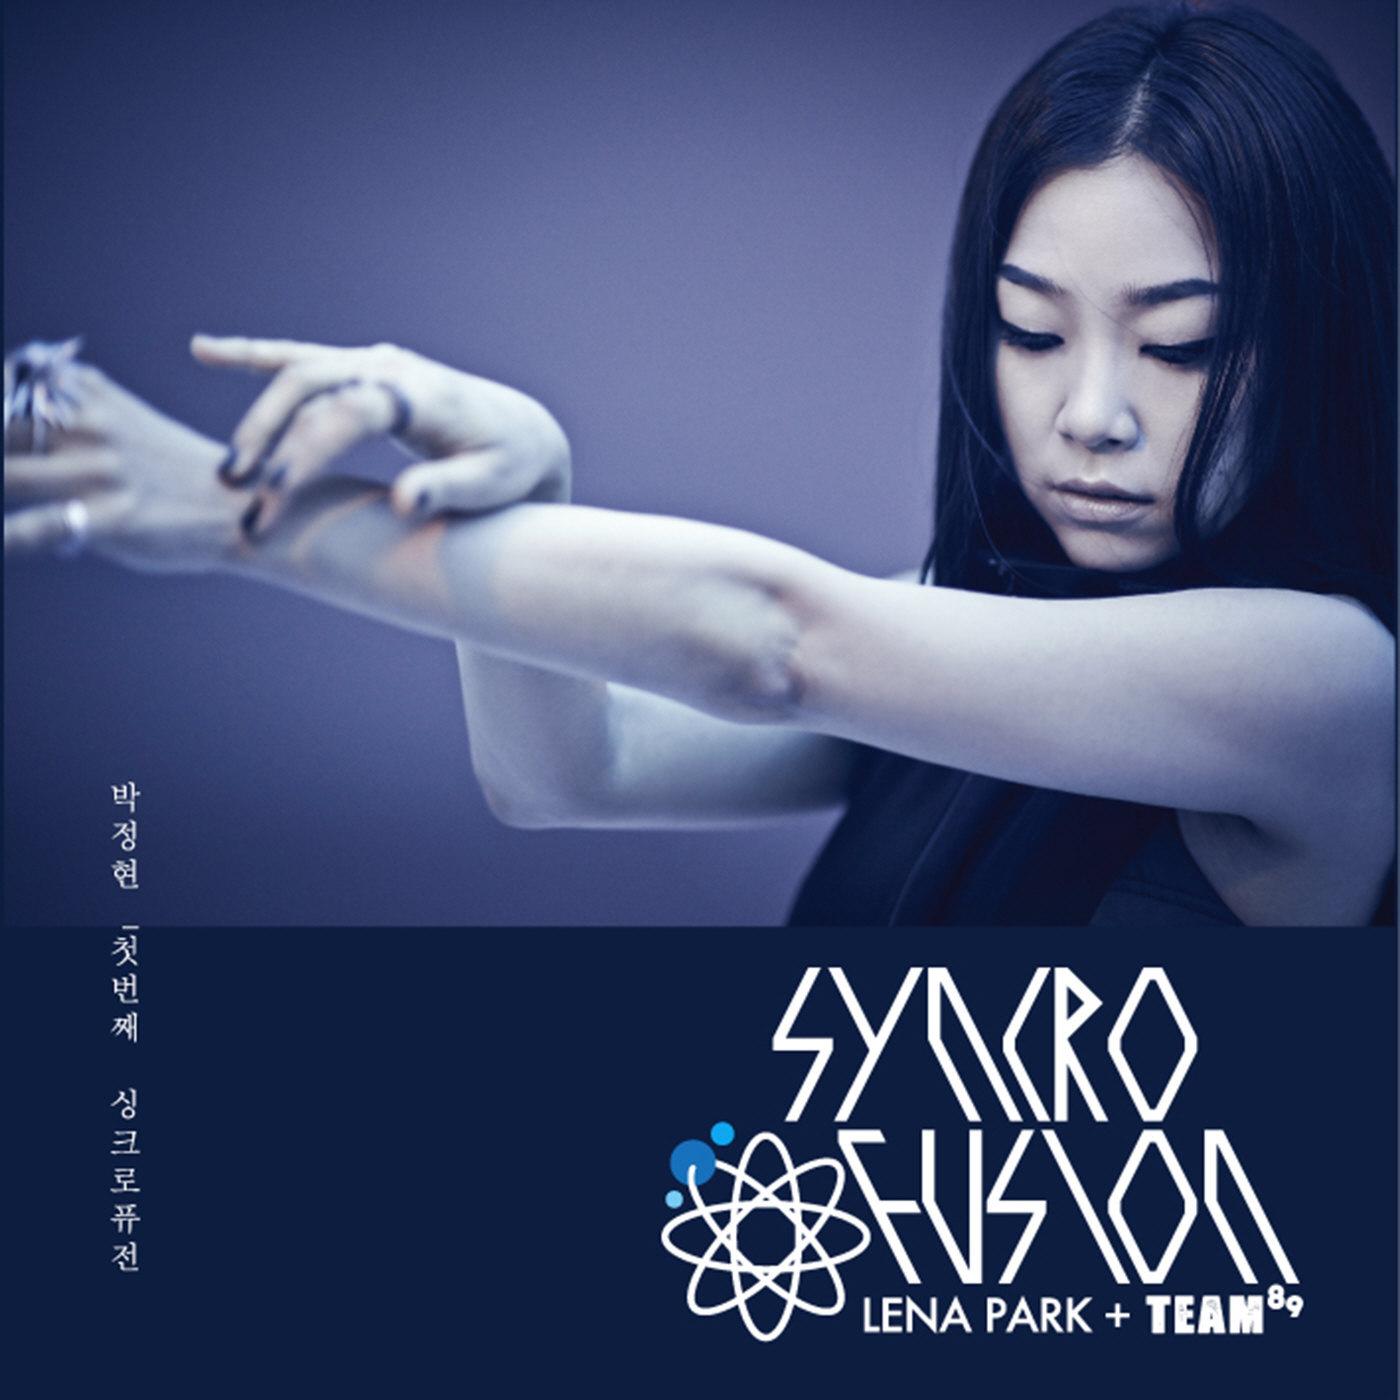 20170521.1655.3 Lena Park - Syncrofusion (single) cover.jpg